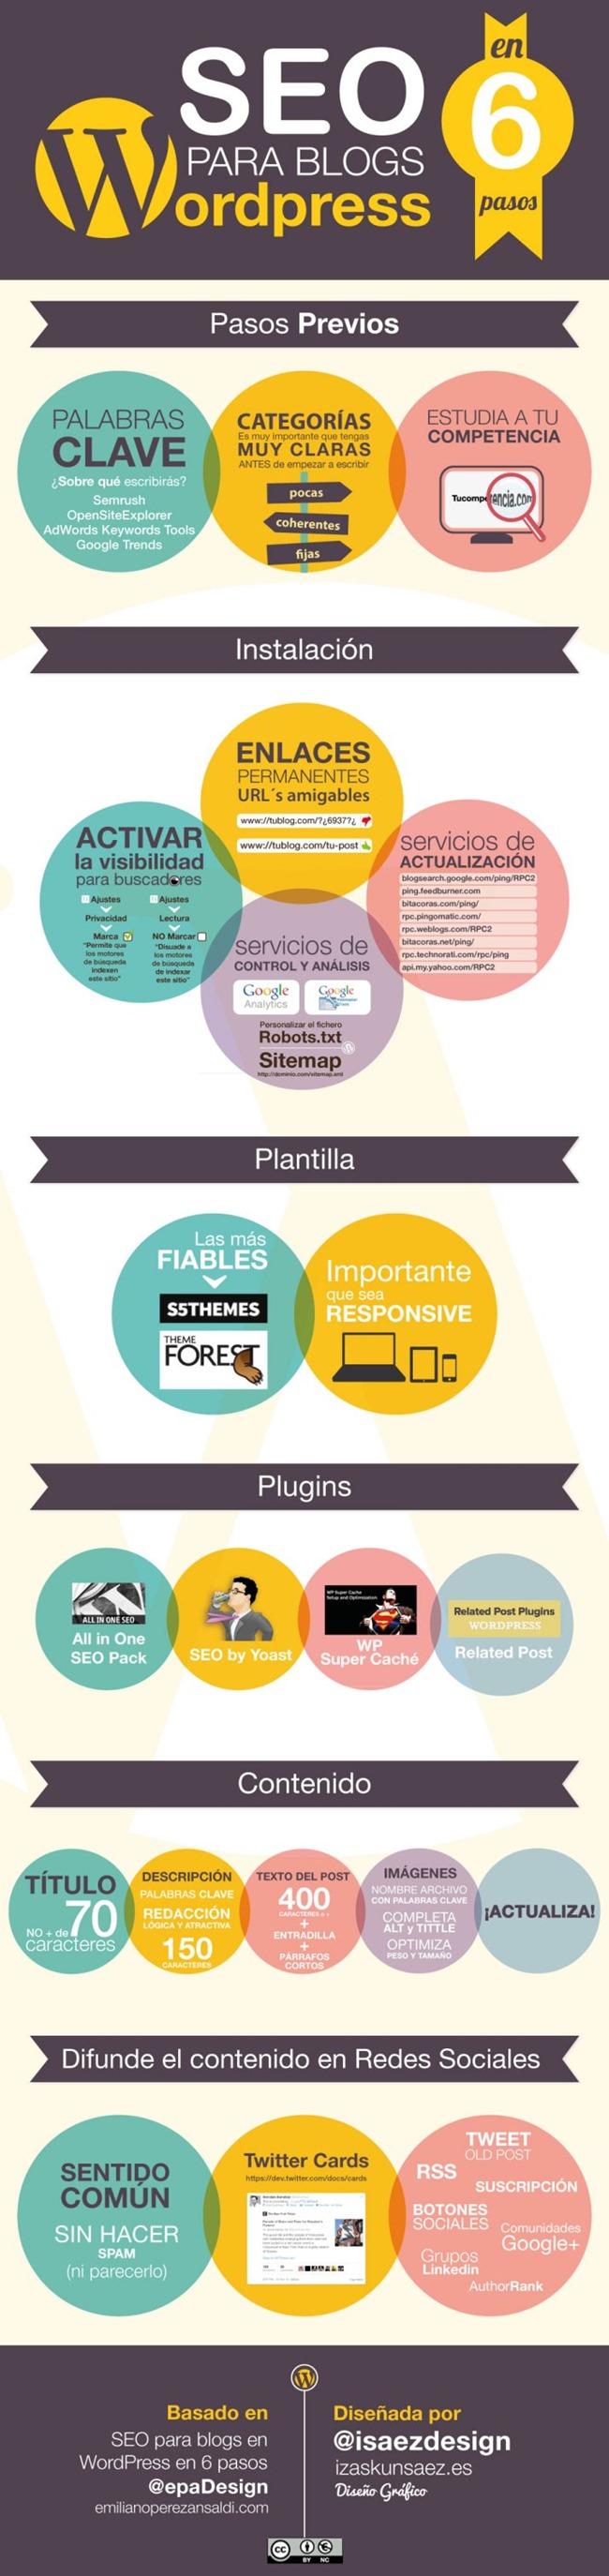 infografia_seo_para_bogs_de_wordpress_en_6_pasos